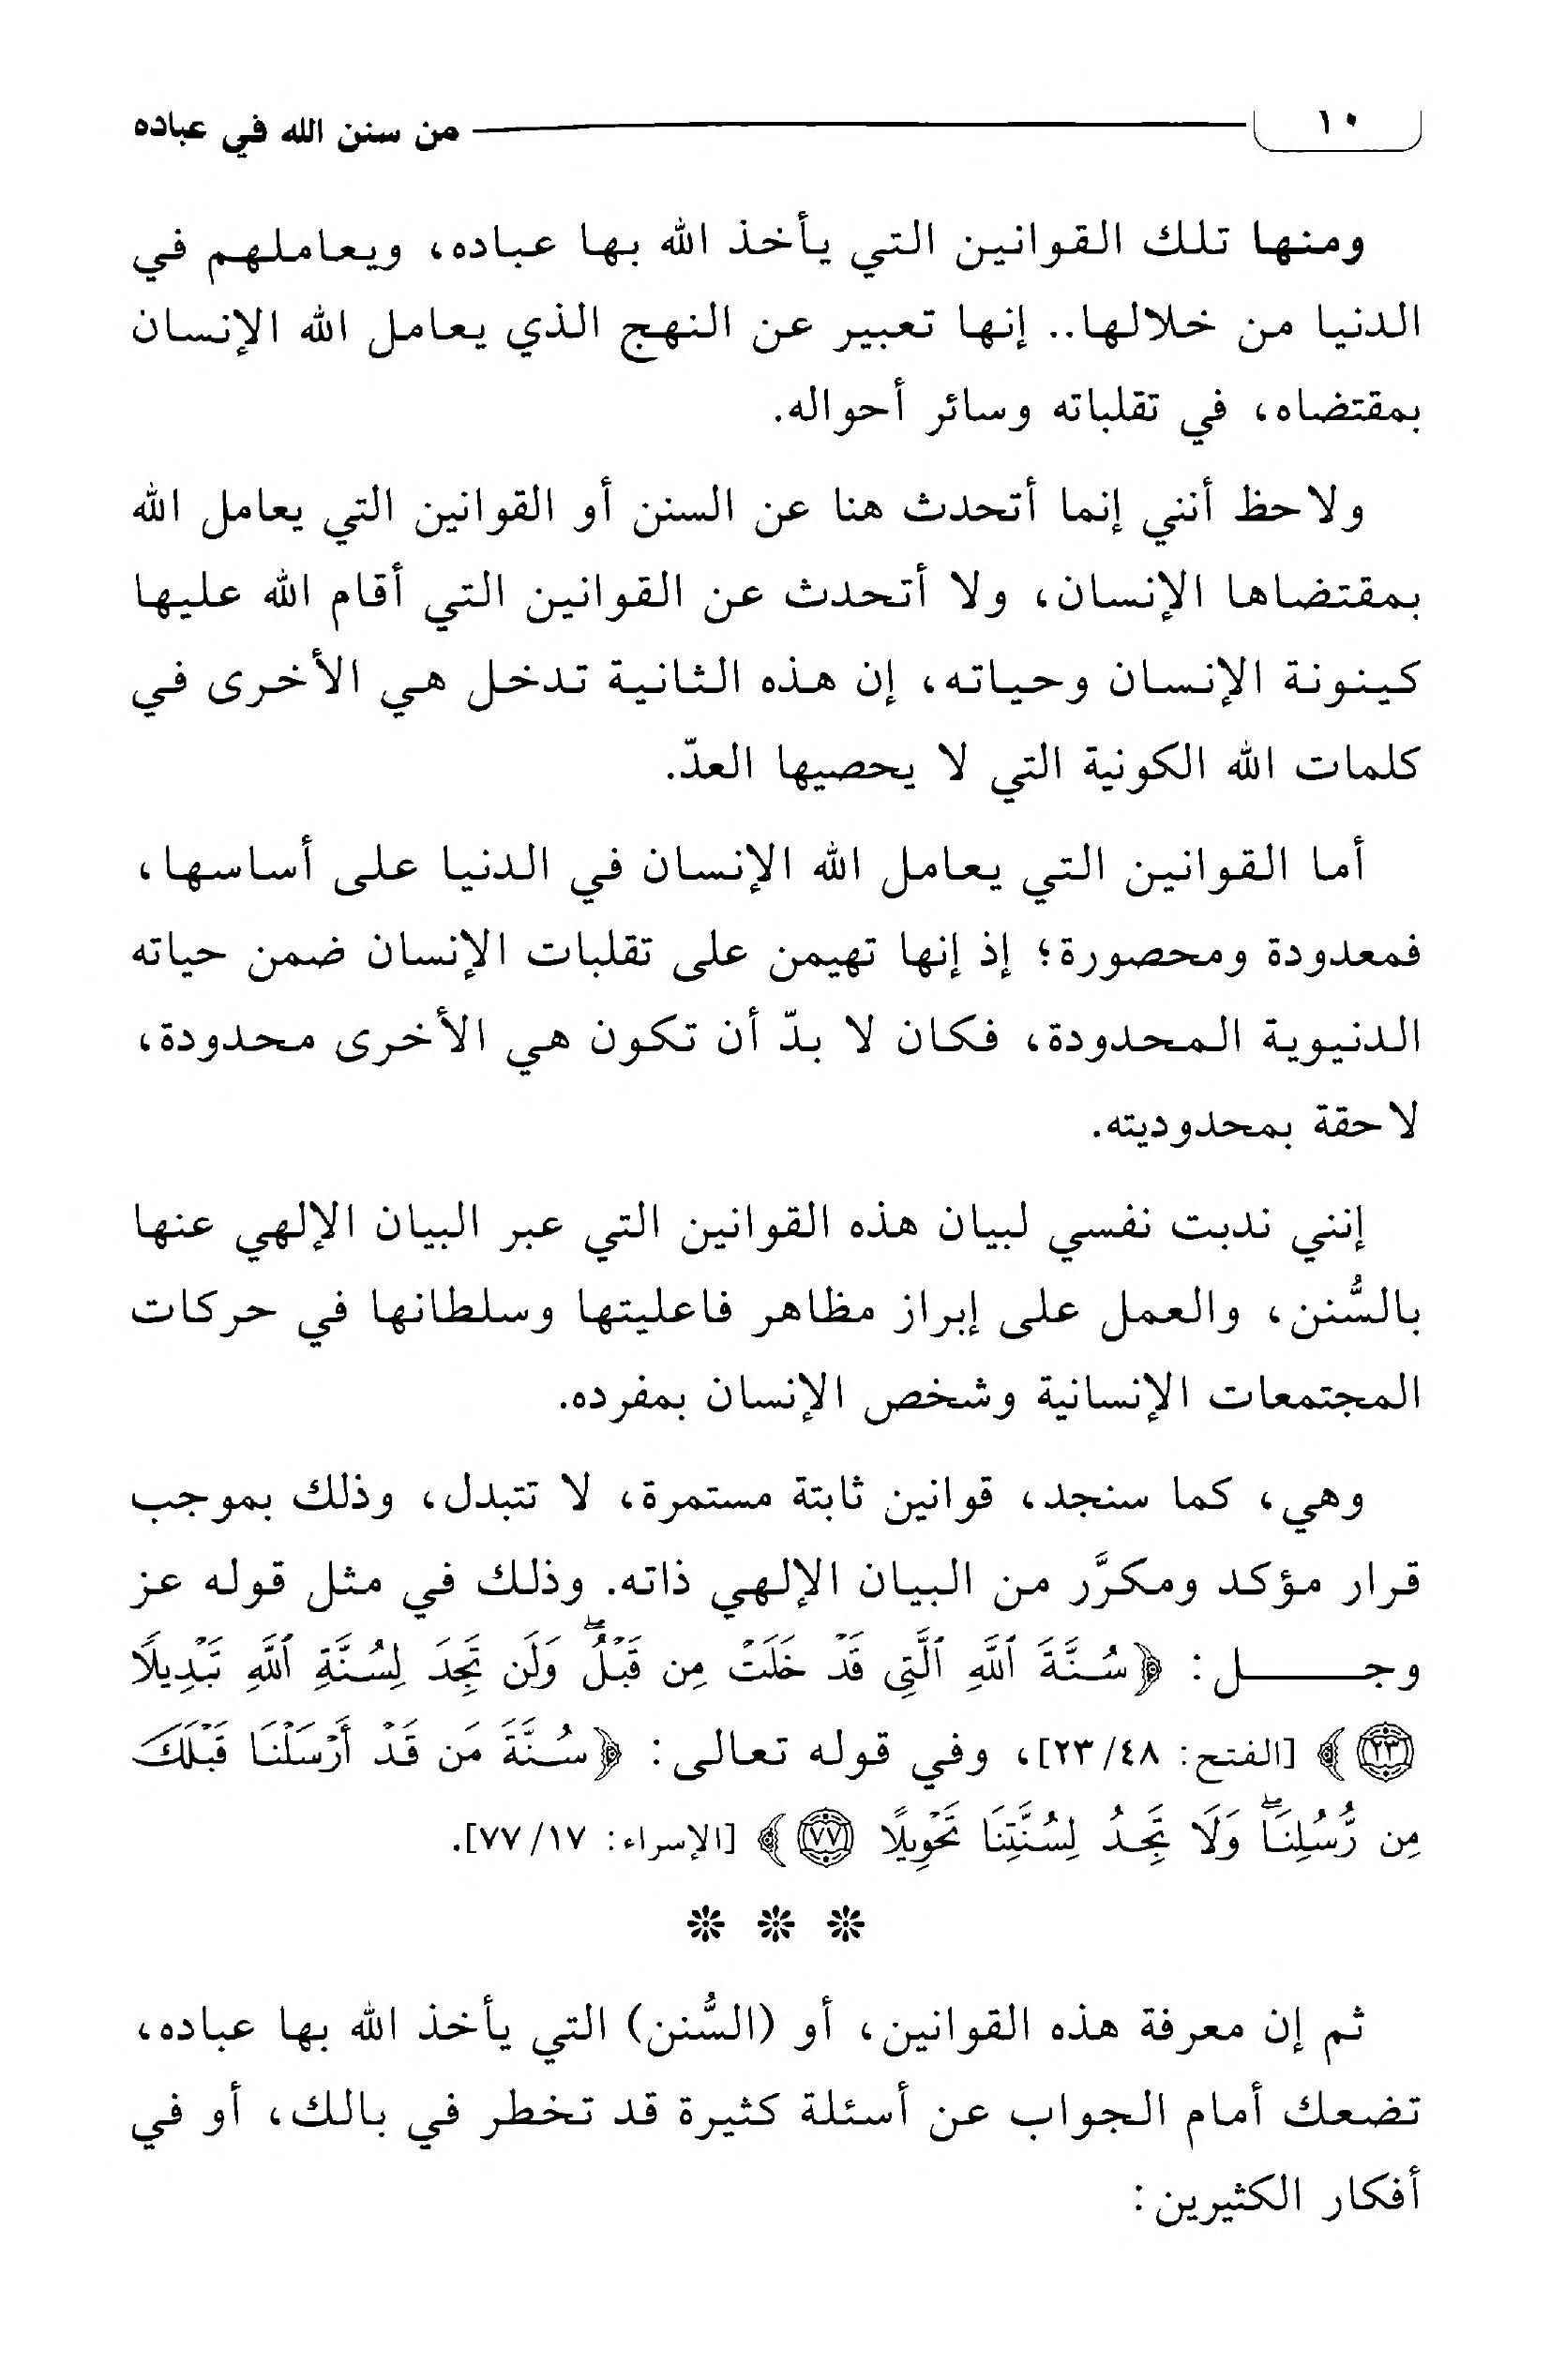 مكتبة محمد سعيد رمضان البوطي رحمه الله Matnawi Free Download Borrow And Streaming Internet Archive Sheet Music Math Math Equations